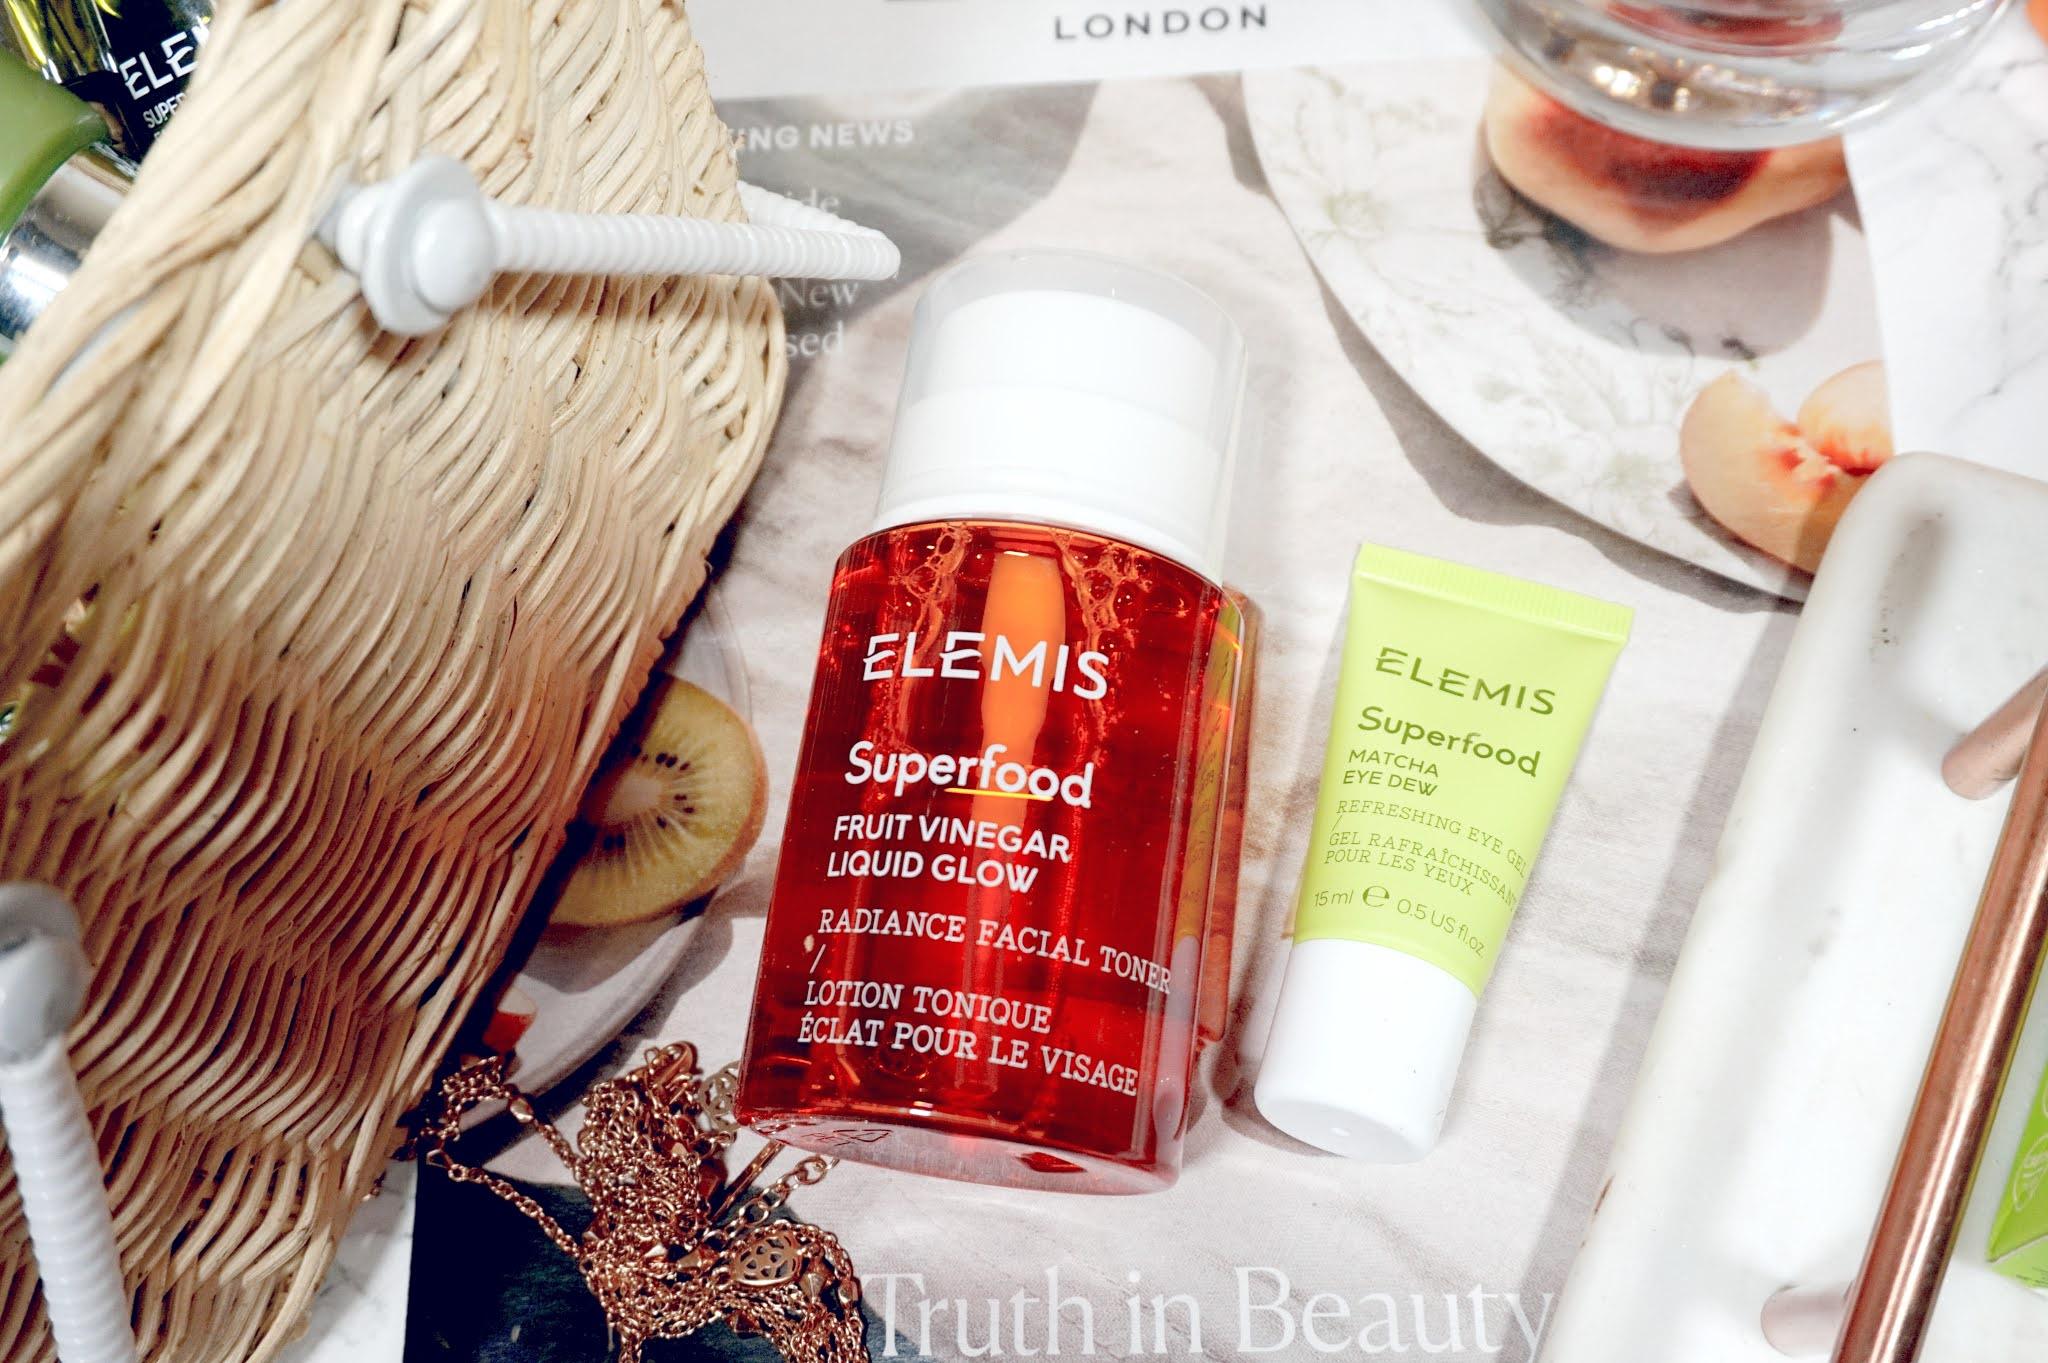 Elemis Superfood Fruit Vinegar Liquid Glow Review